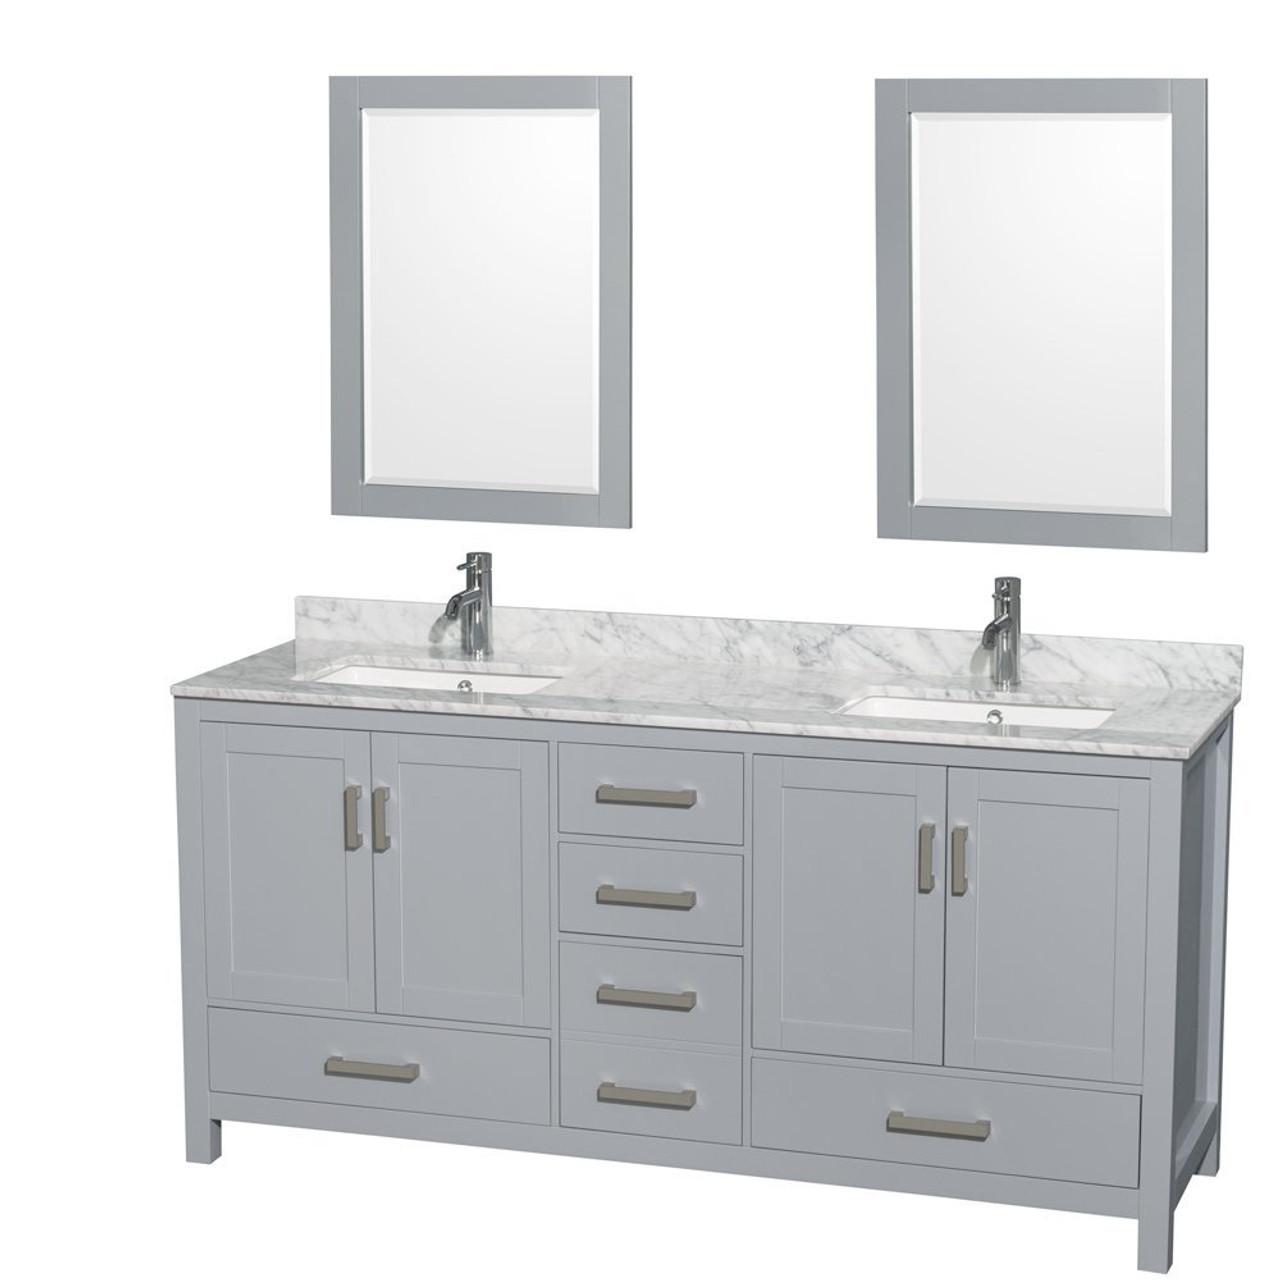 armada 72 double sink bathroom vanity light grey